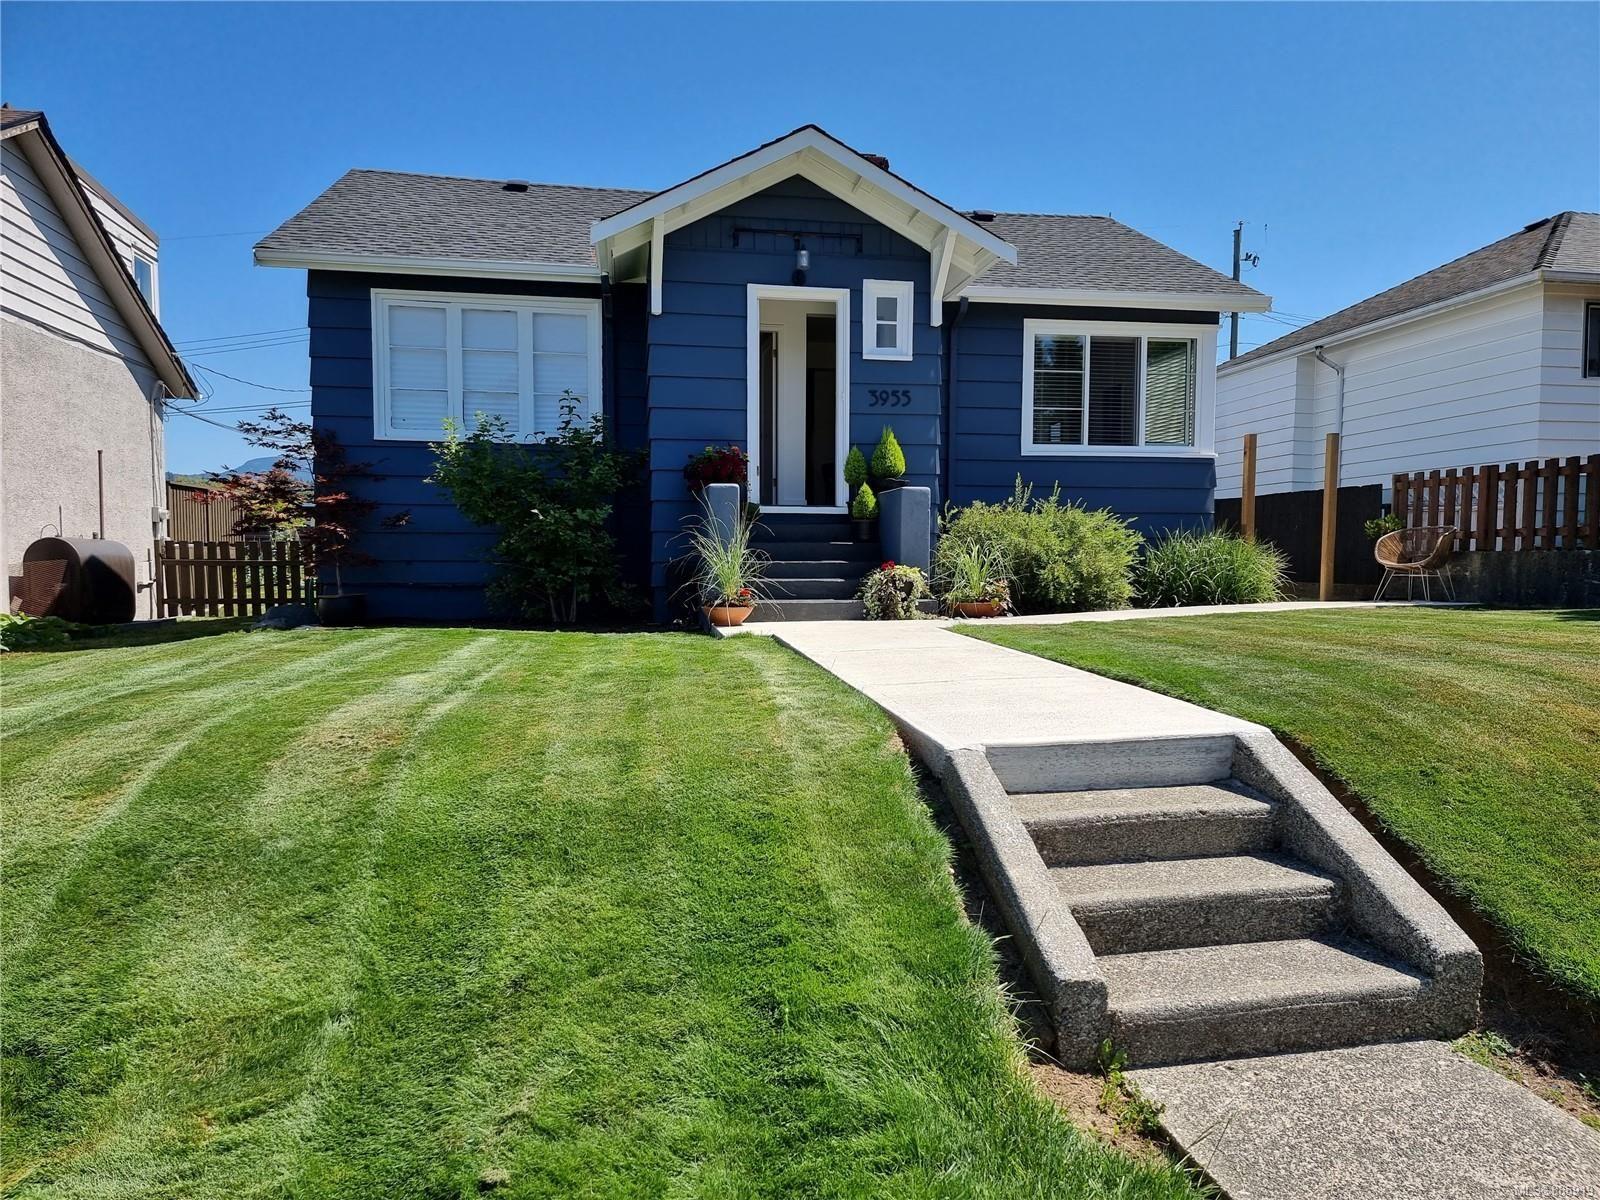 Main Photo: 3955 4th Ave in : PA Port Alberni House for sale (Port Alberni)  : MLS®# 885919